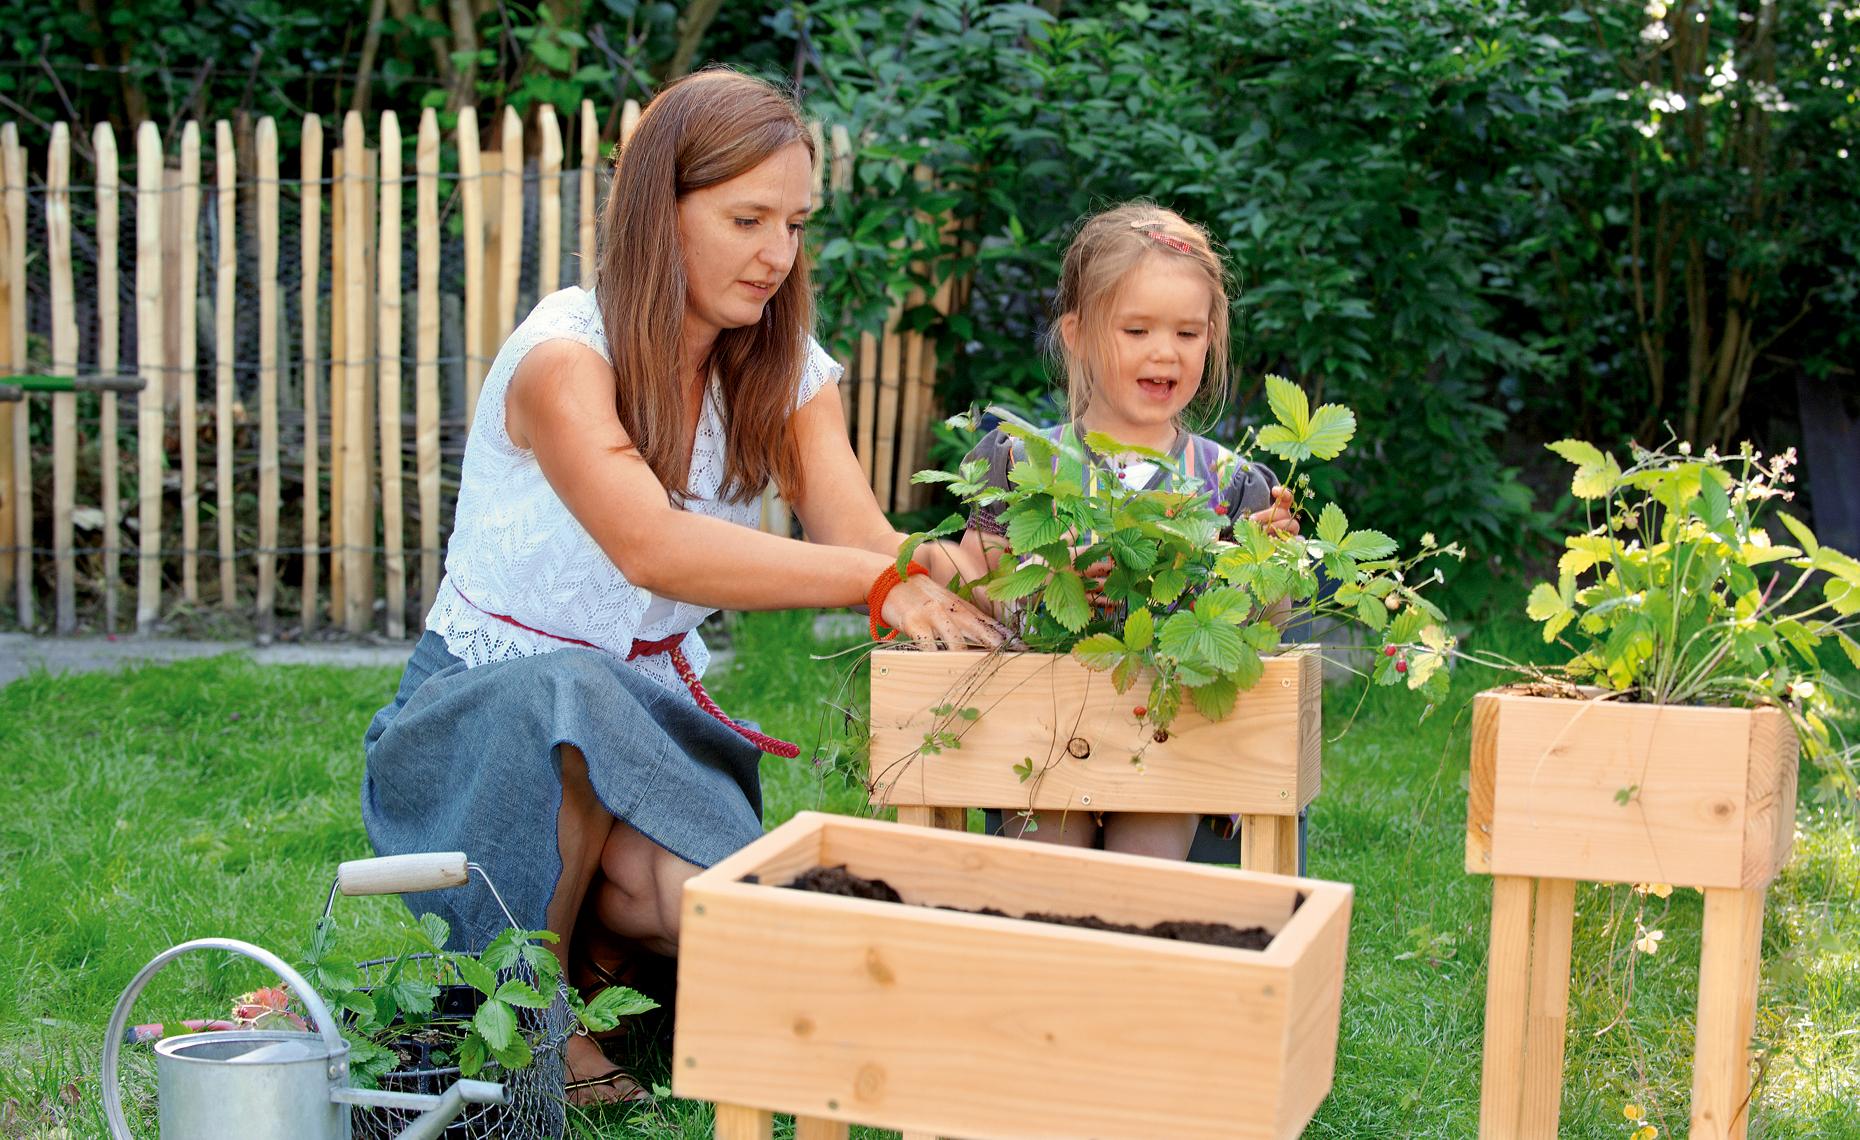 diy ideen ein hochhaus mit erdbeeren bauen himbeer. Black Bedroom Furniture Sets. Home Design Ideas